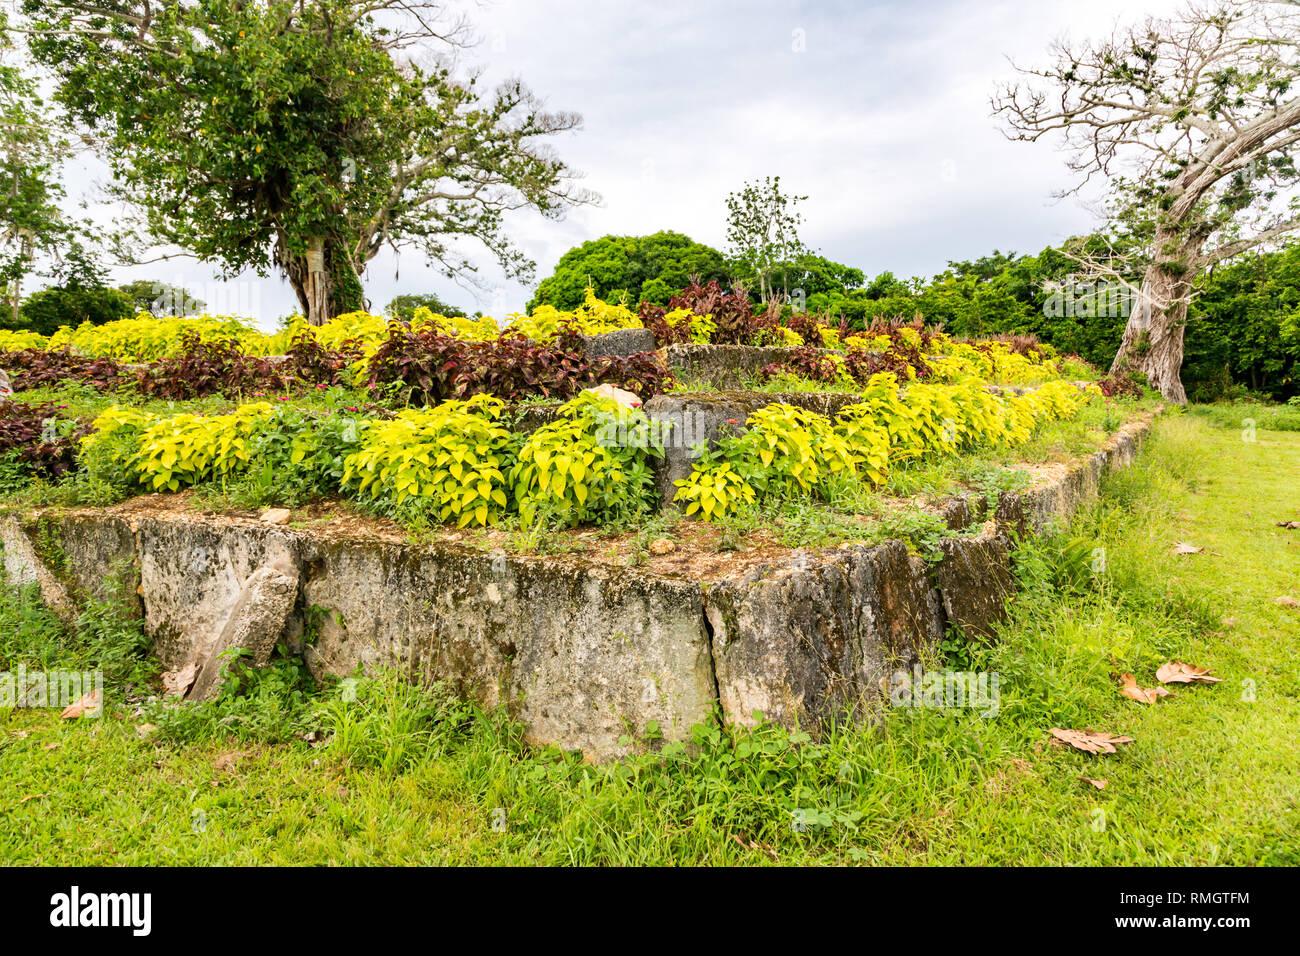 Ancient ziggurat Langi - Royal burial tomb - Lapaha, Mu'a, Tongatapu island, Tonga, Polynesia, Oceania. Stone vault, stepped pyramid, megaliths. Stock Photo